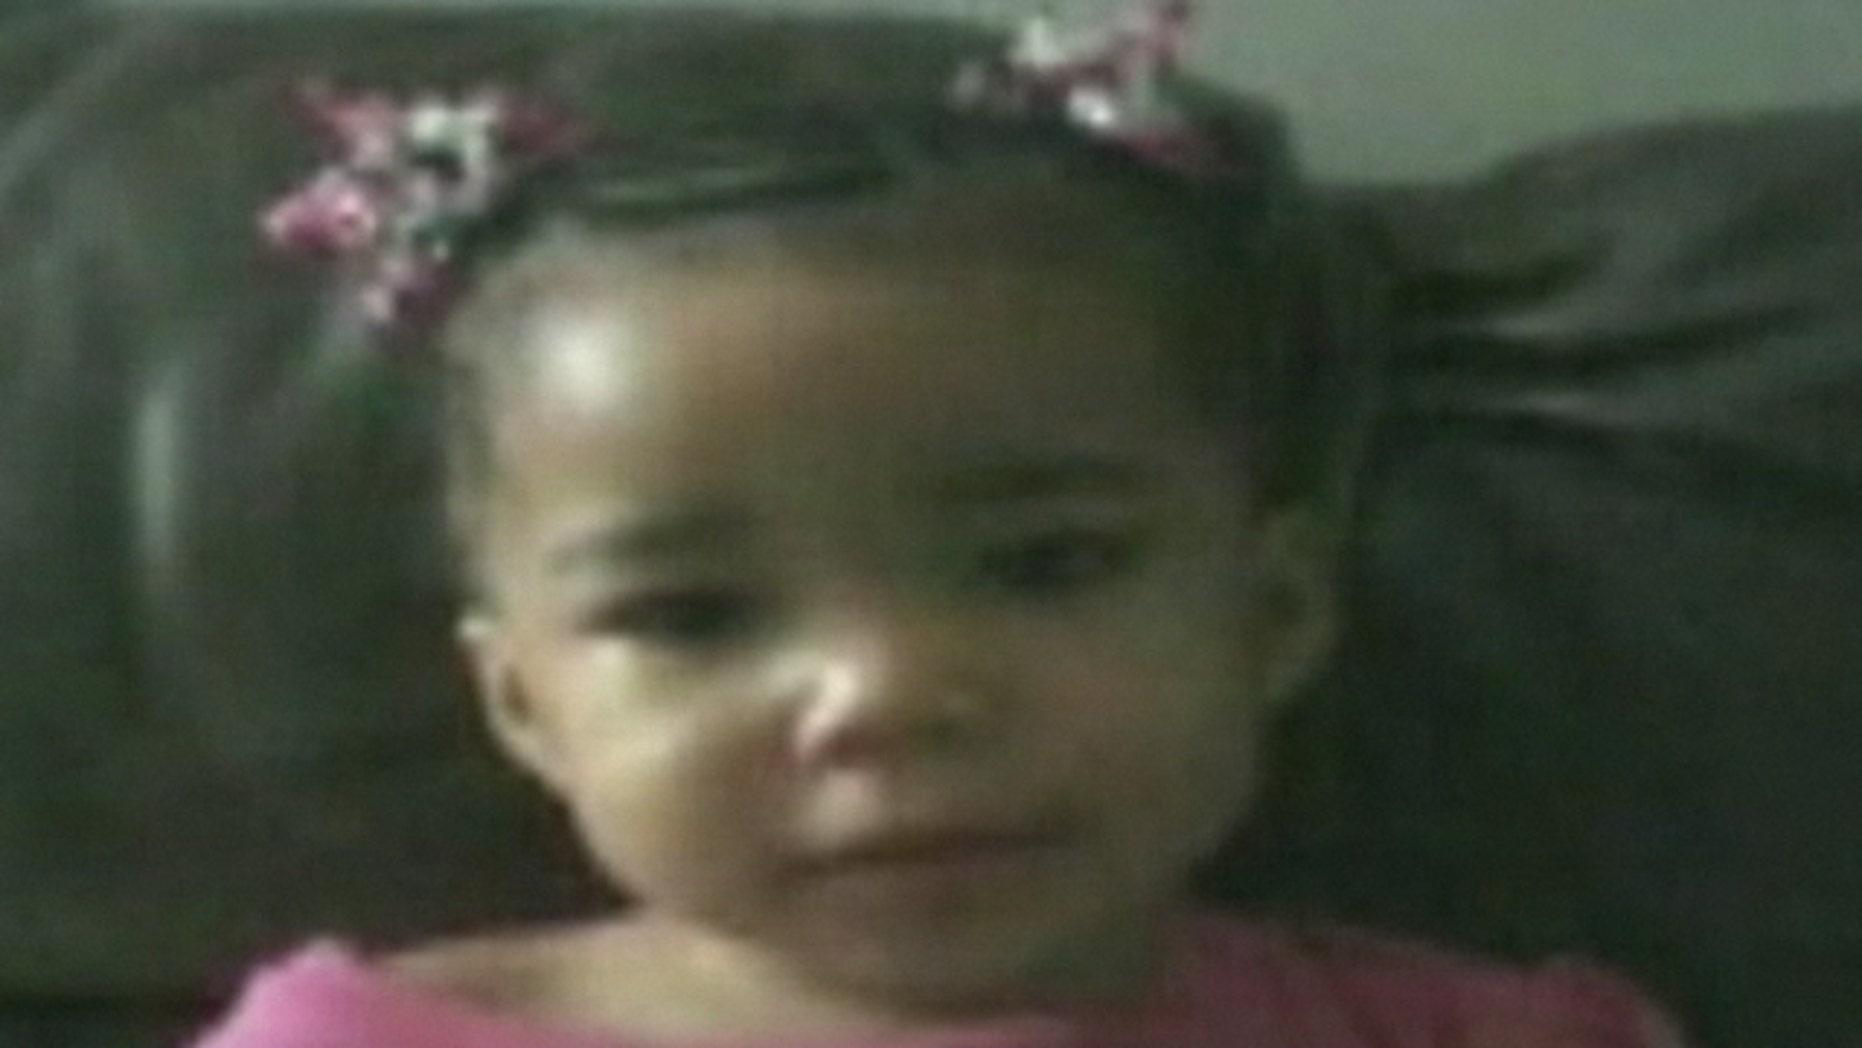 December 3, 2011: This photo shows missing toddler Bianca Jones.